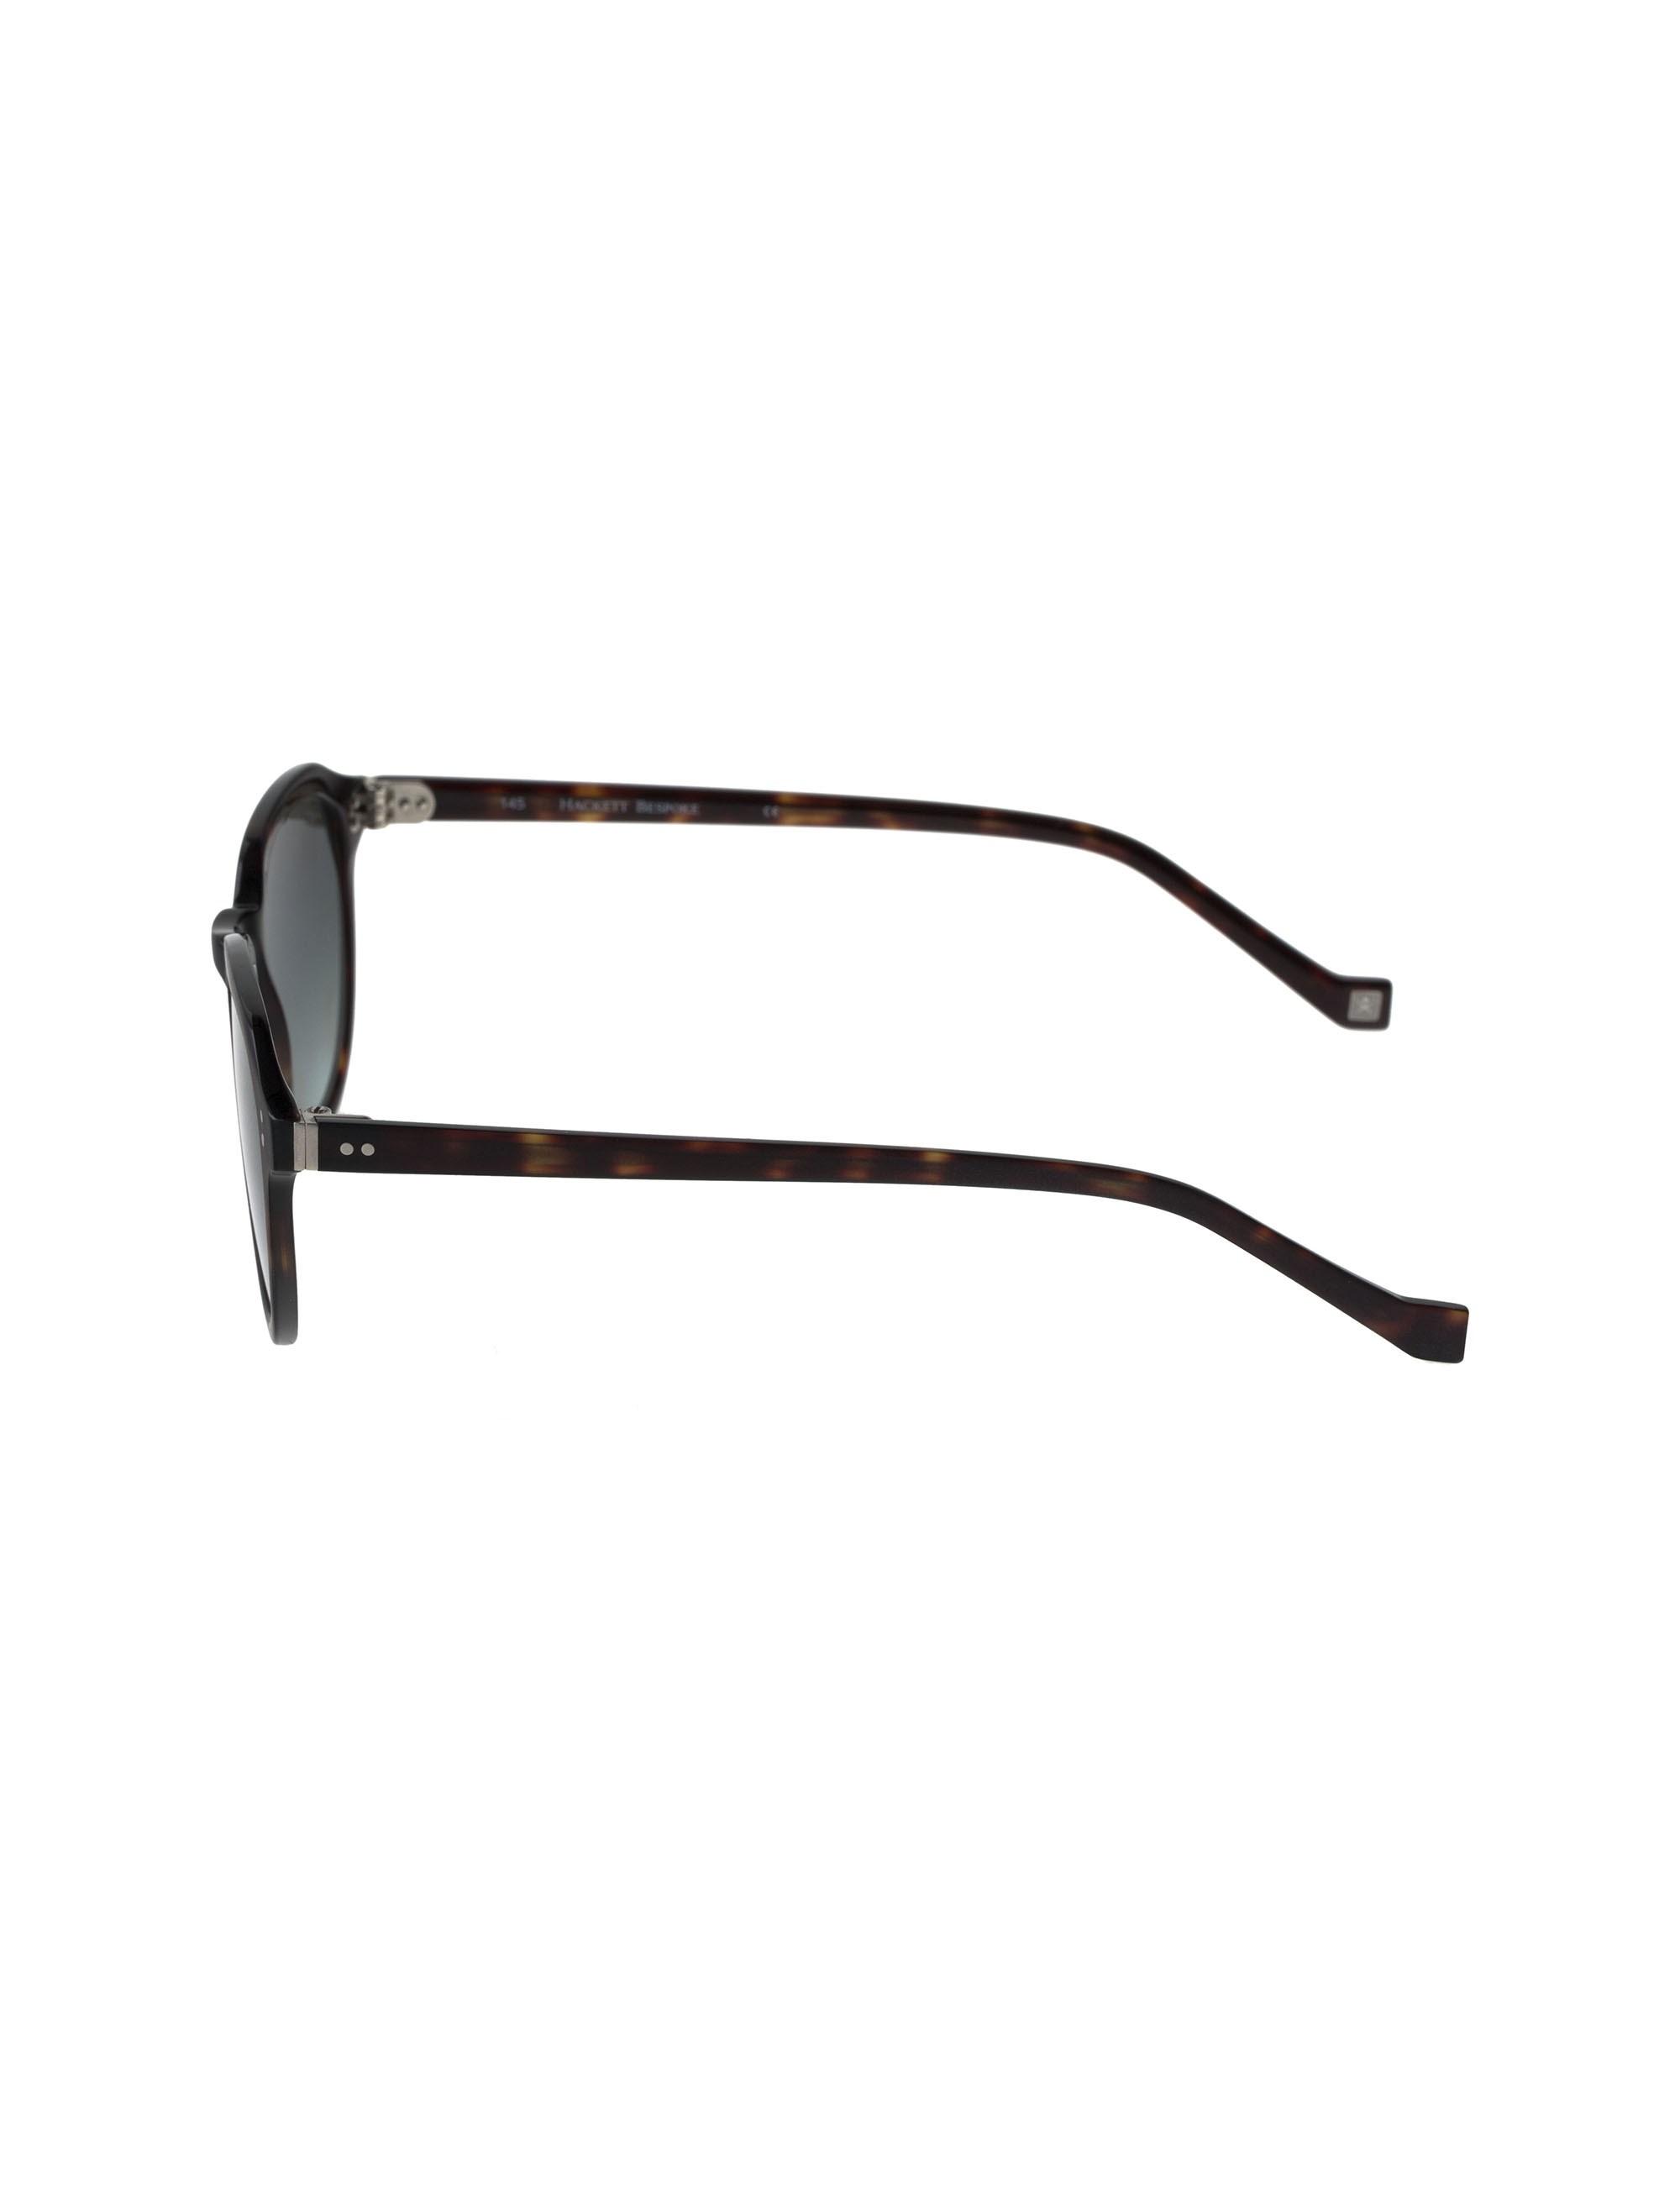 عینک آفتابی پنتوس زنانه - هکت - قهوه اي    - 3